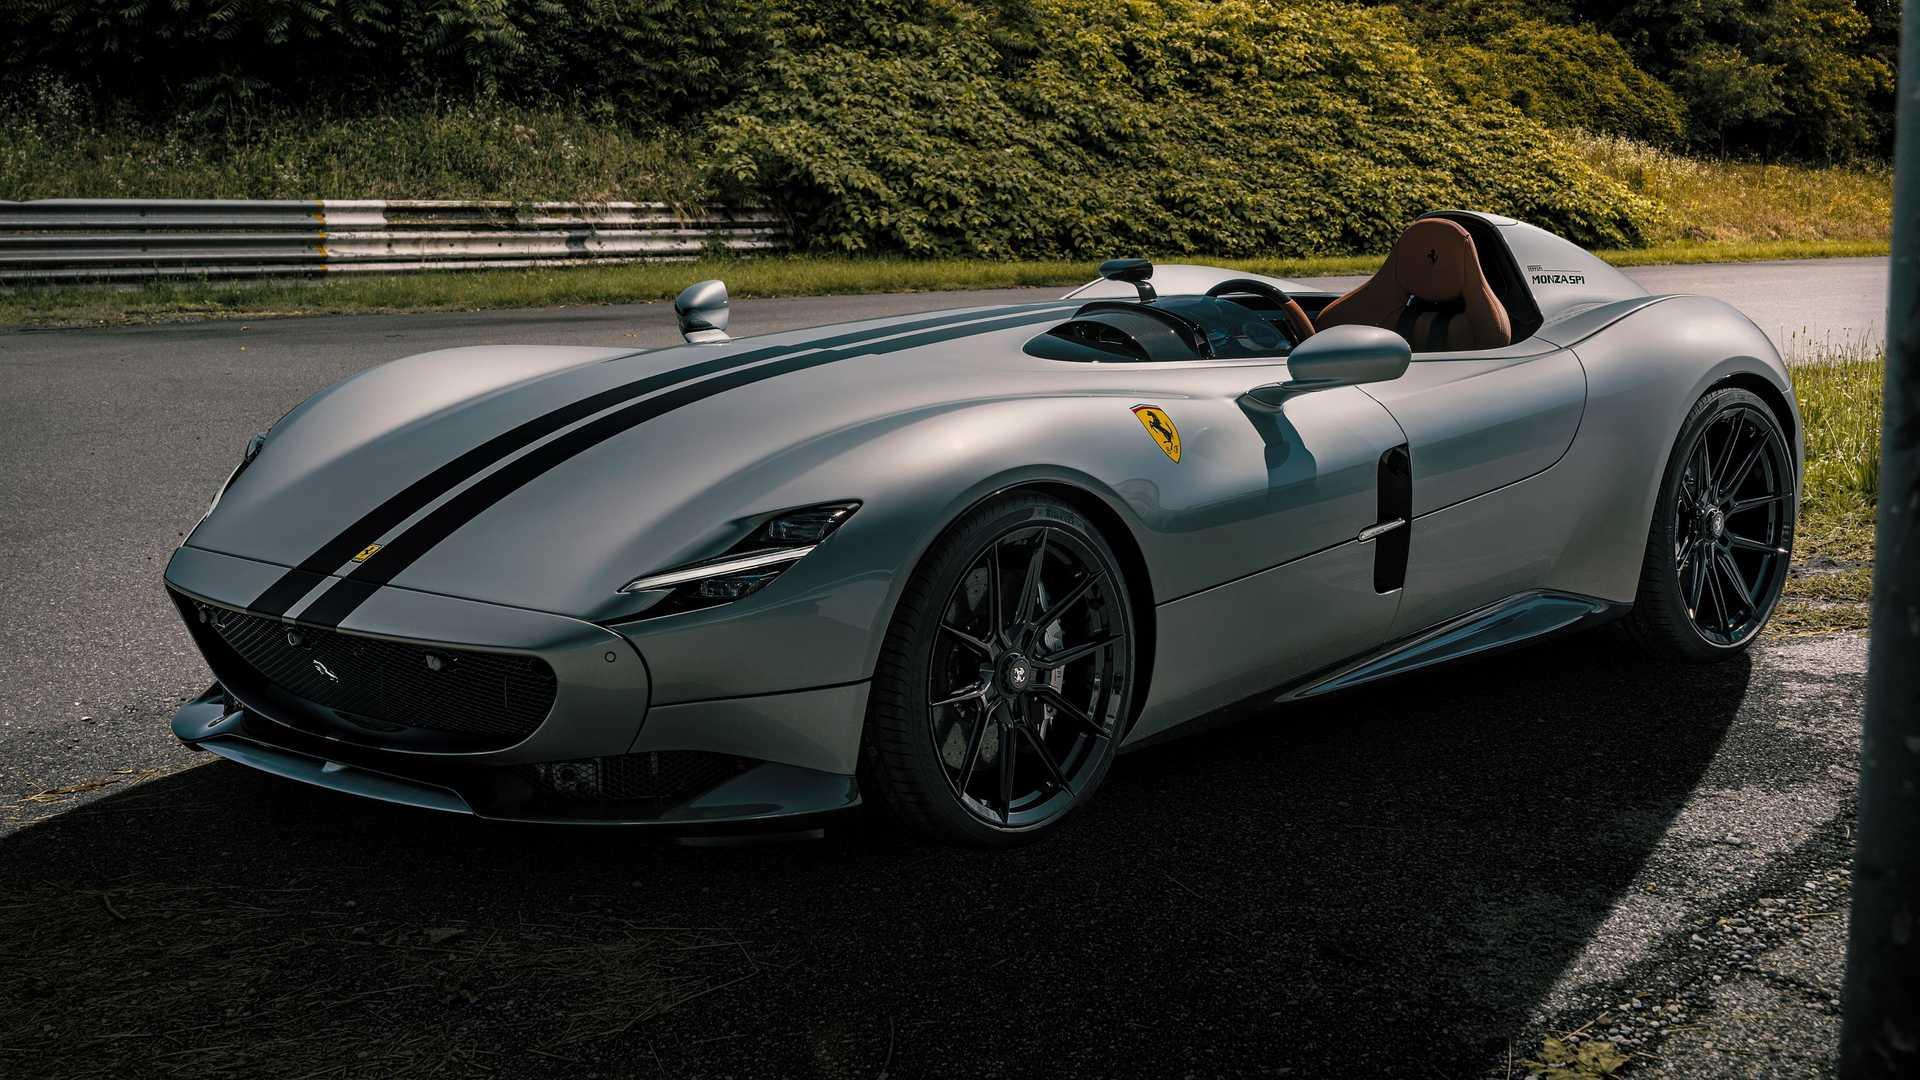 Ferrari_Monza_SP1_tuning_by_Novitec_0002